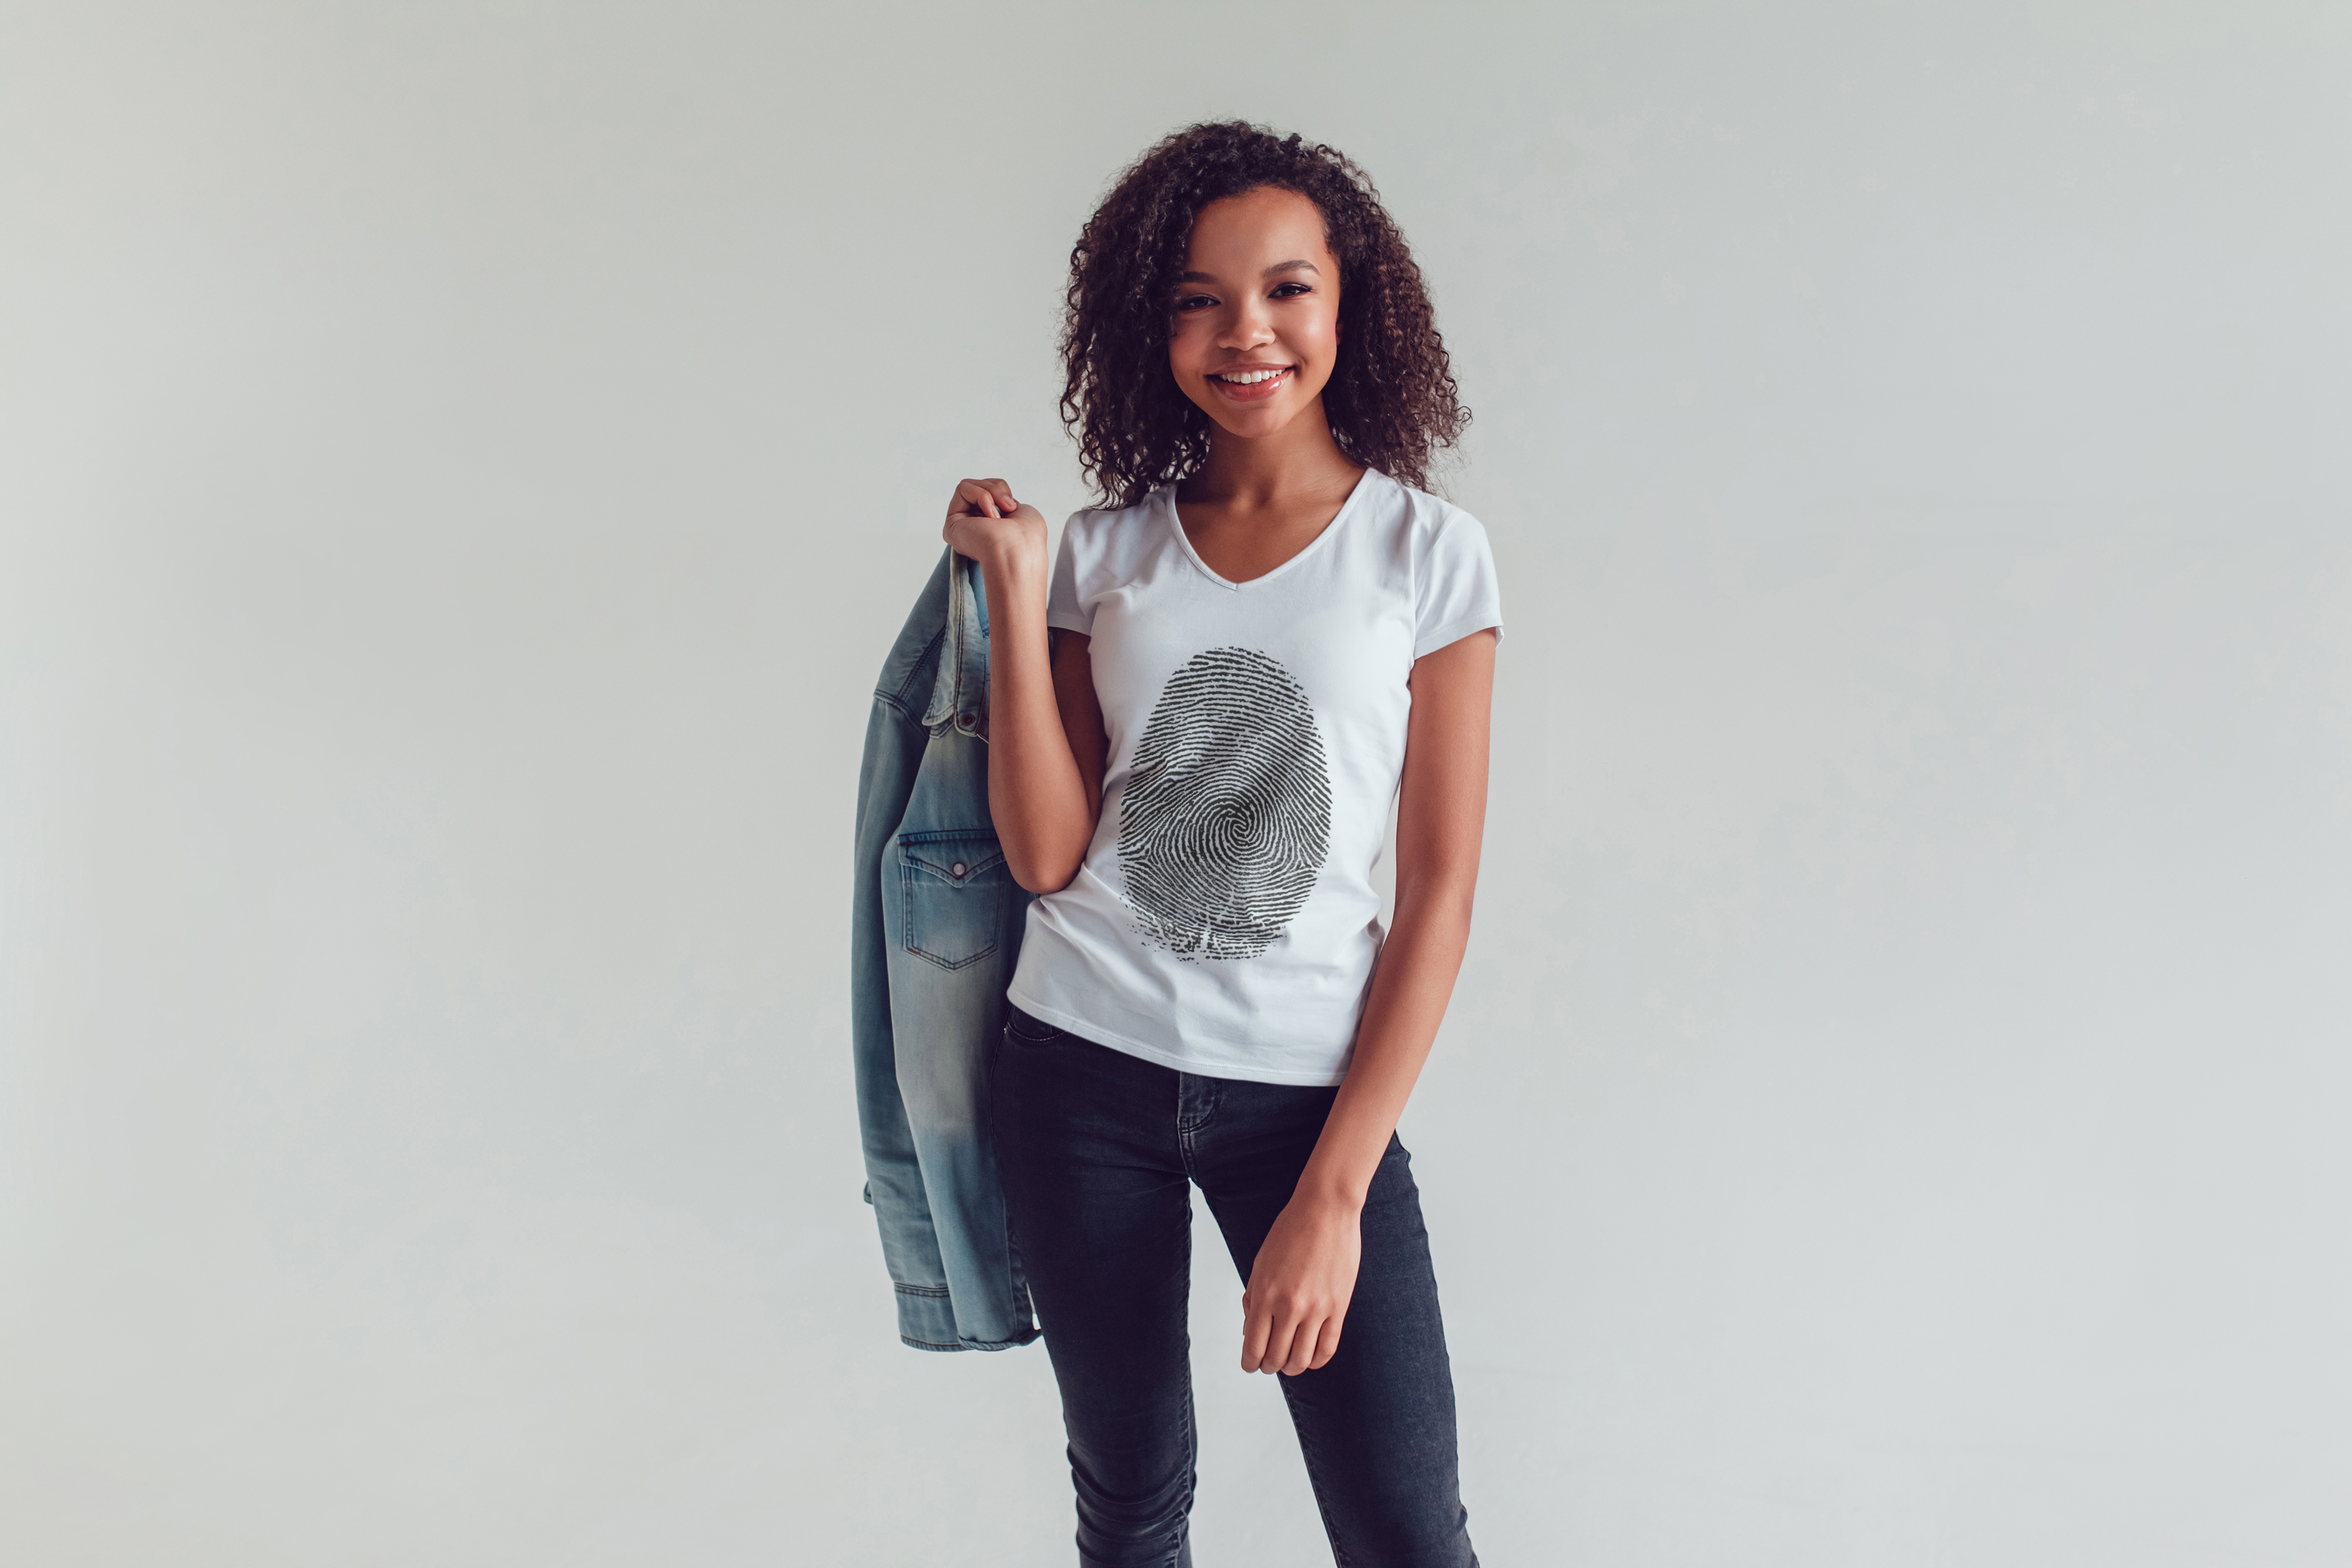 T-Shirt Mock-Up Vol.20 2017 example image 7